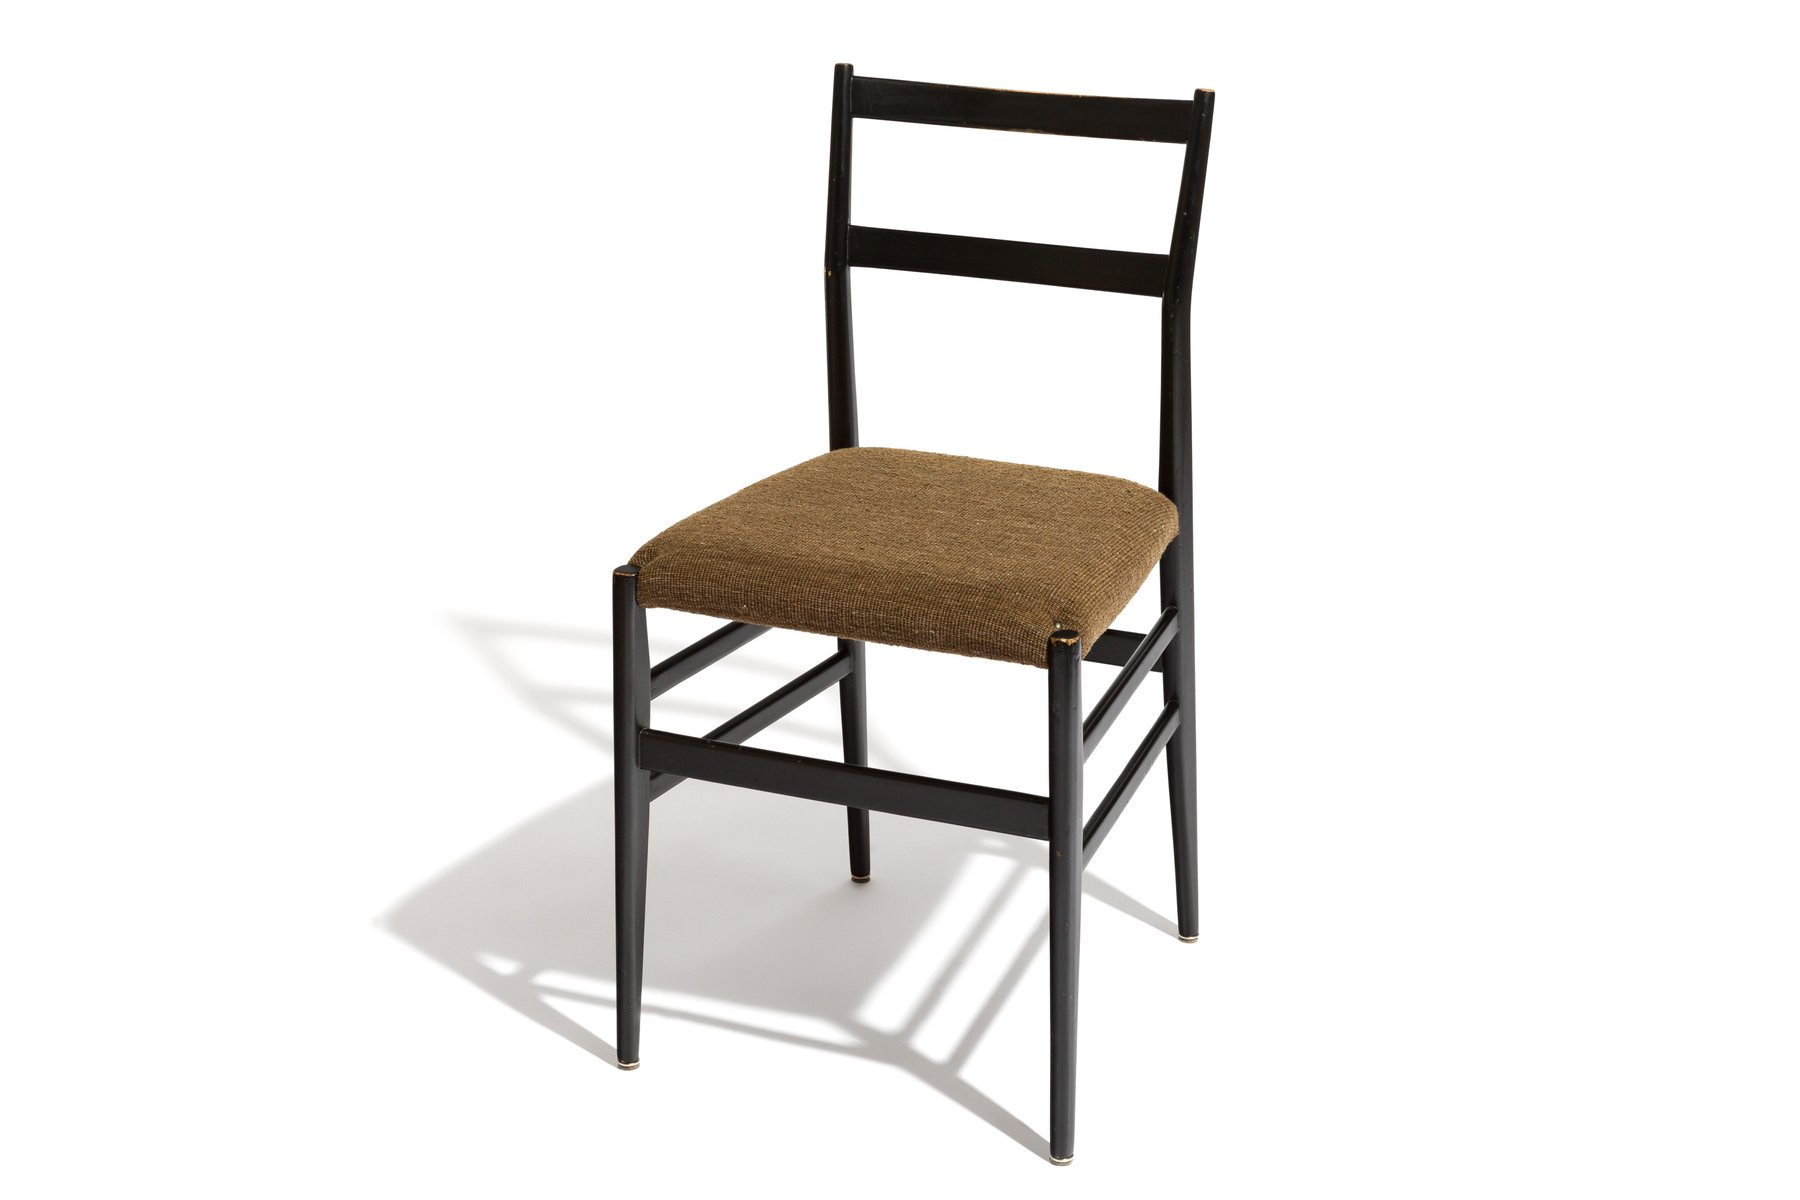 Vintage 646 Leggera Chairs by Gio Ponti for Cassina, Set